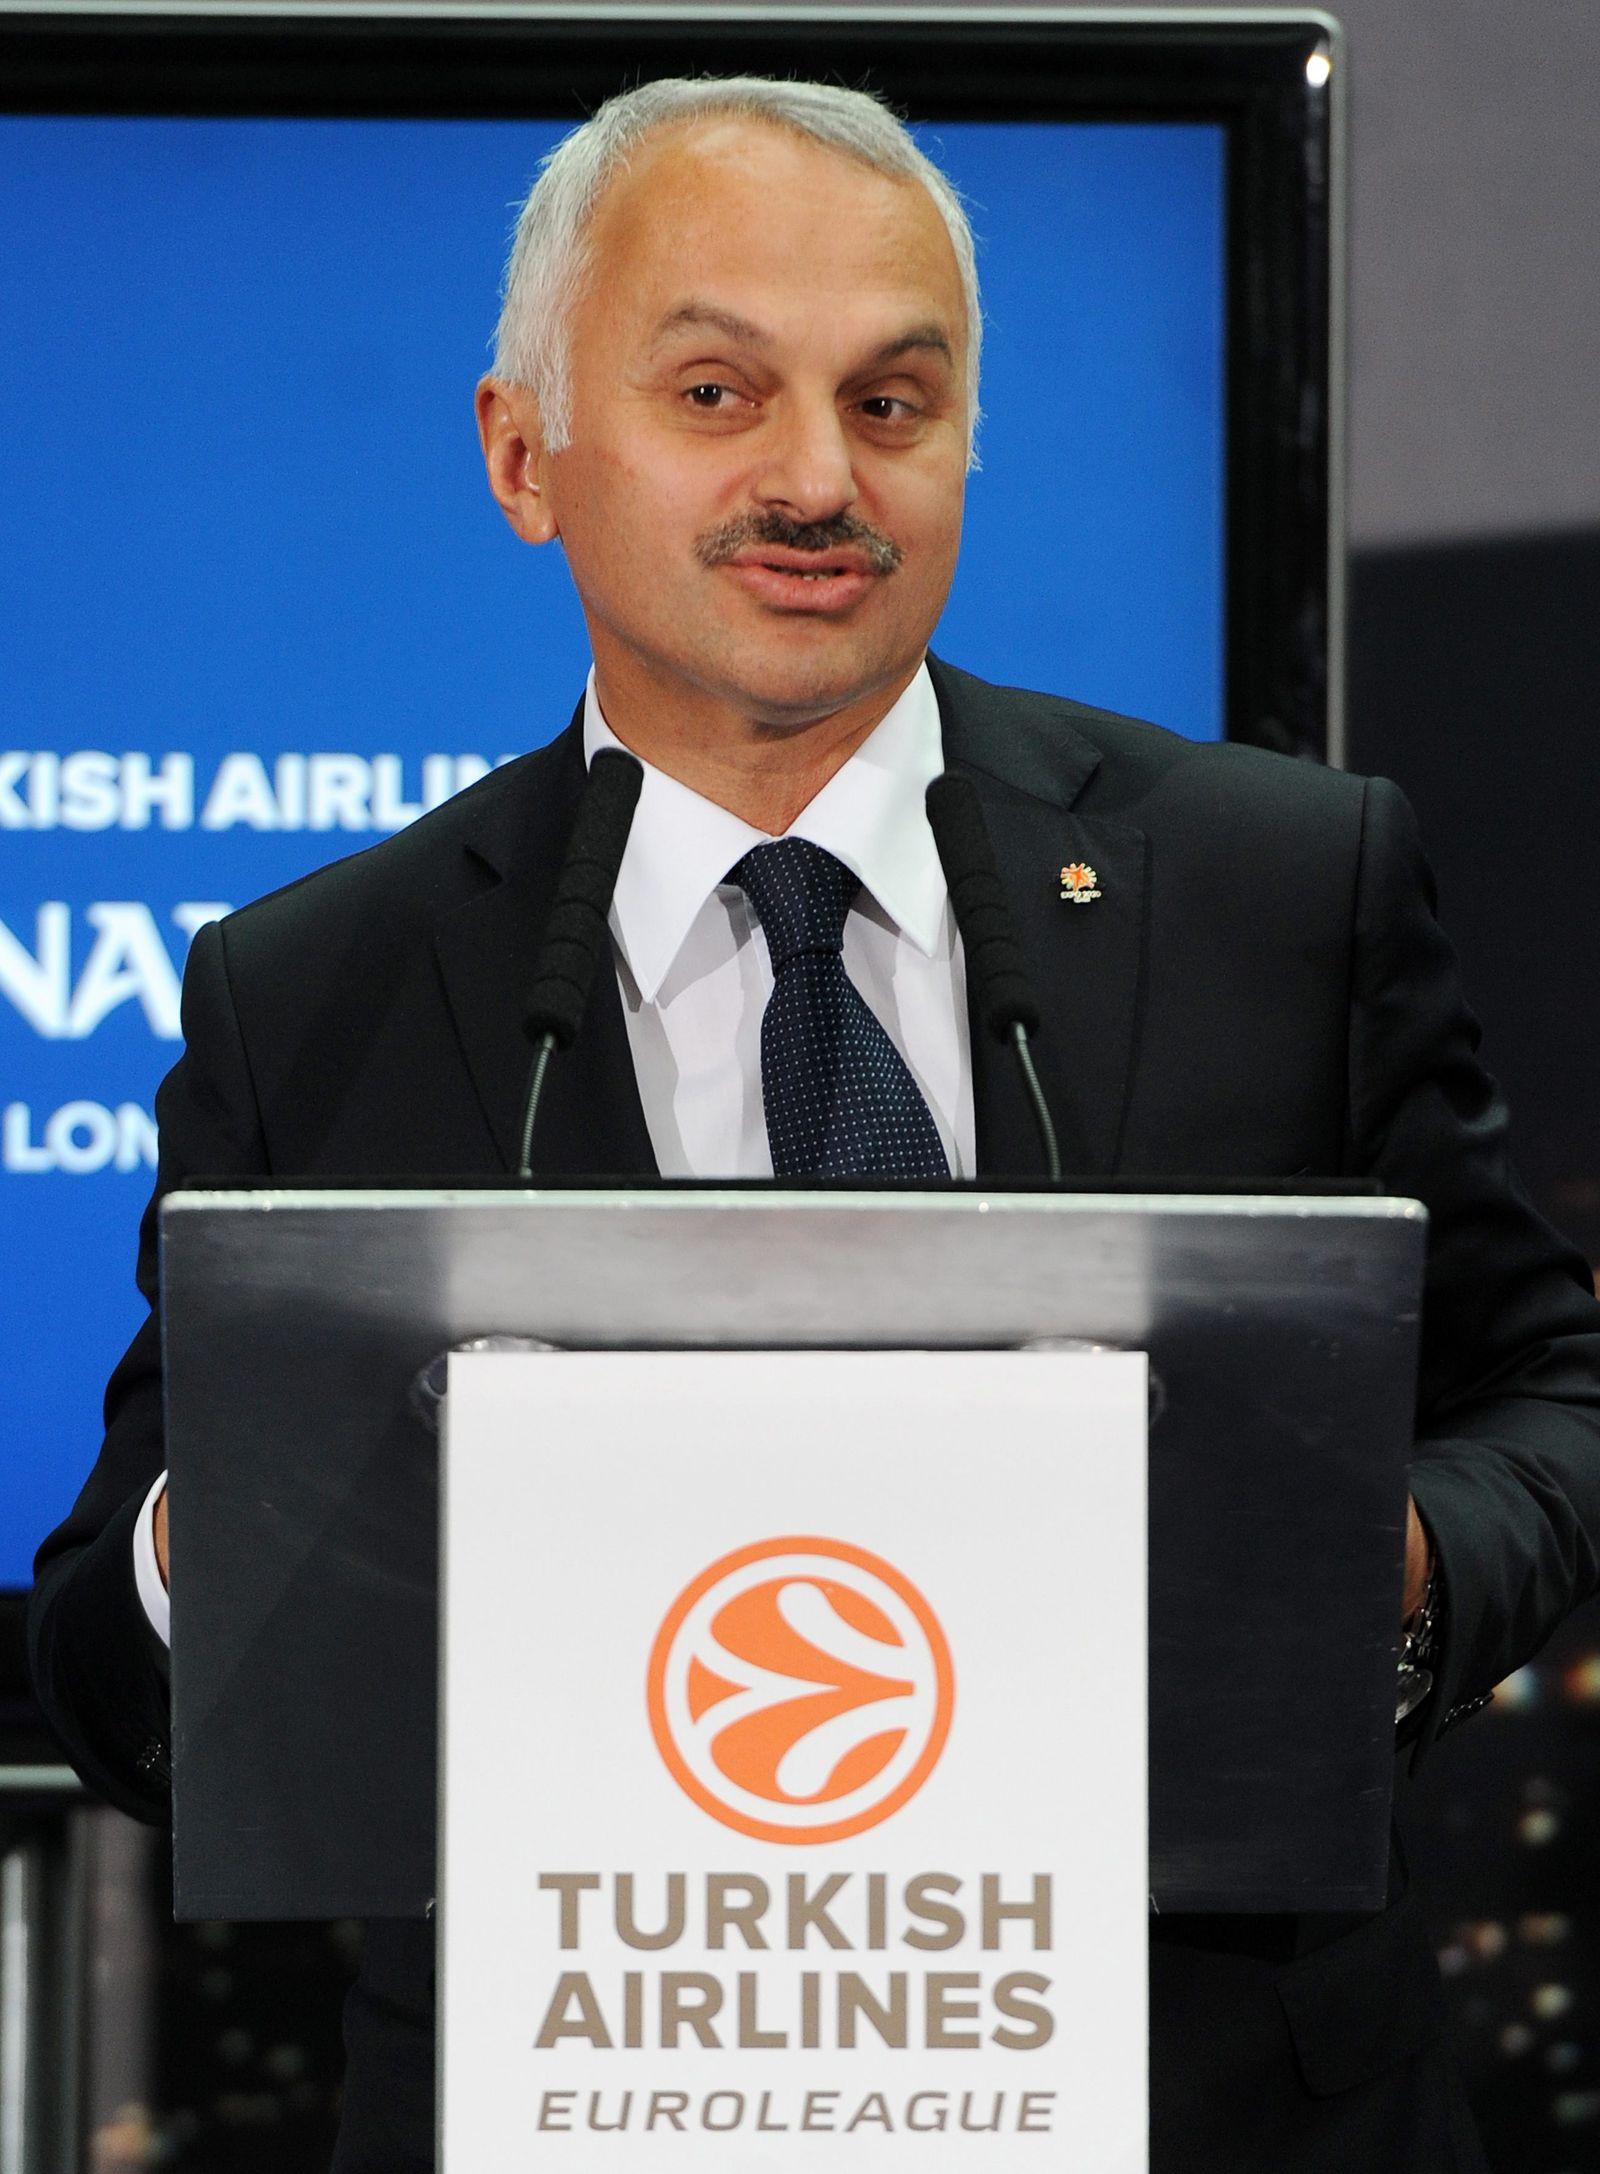 Euroleague Basketball Final Four in London